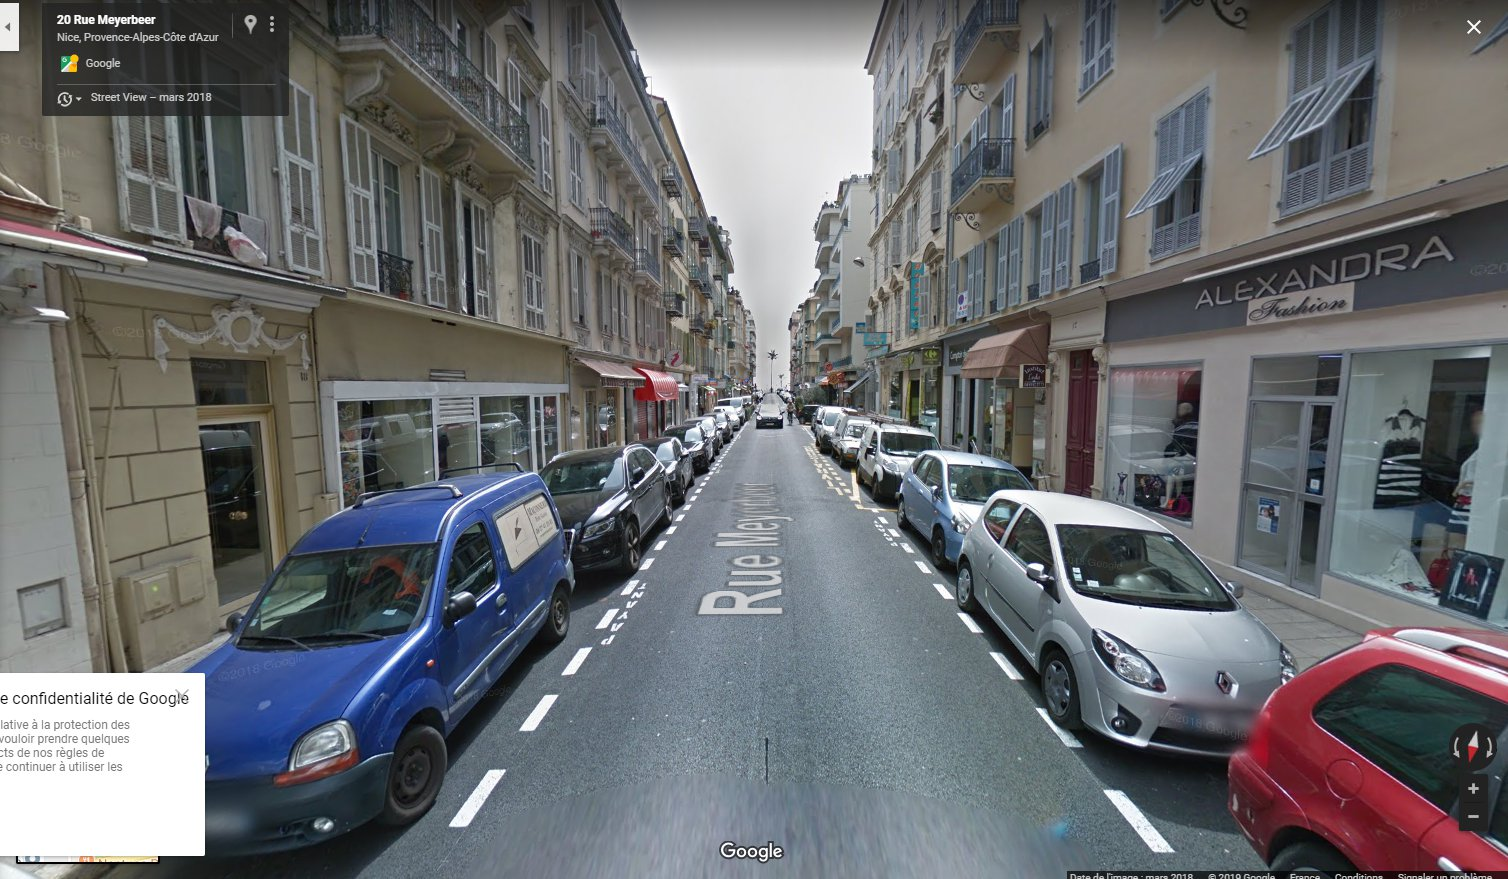 Trade Fund - Meyerbeer Street